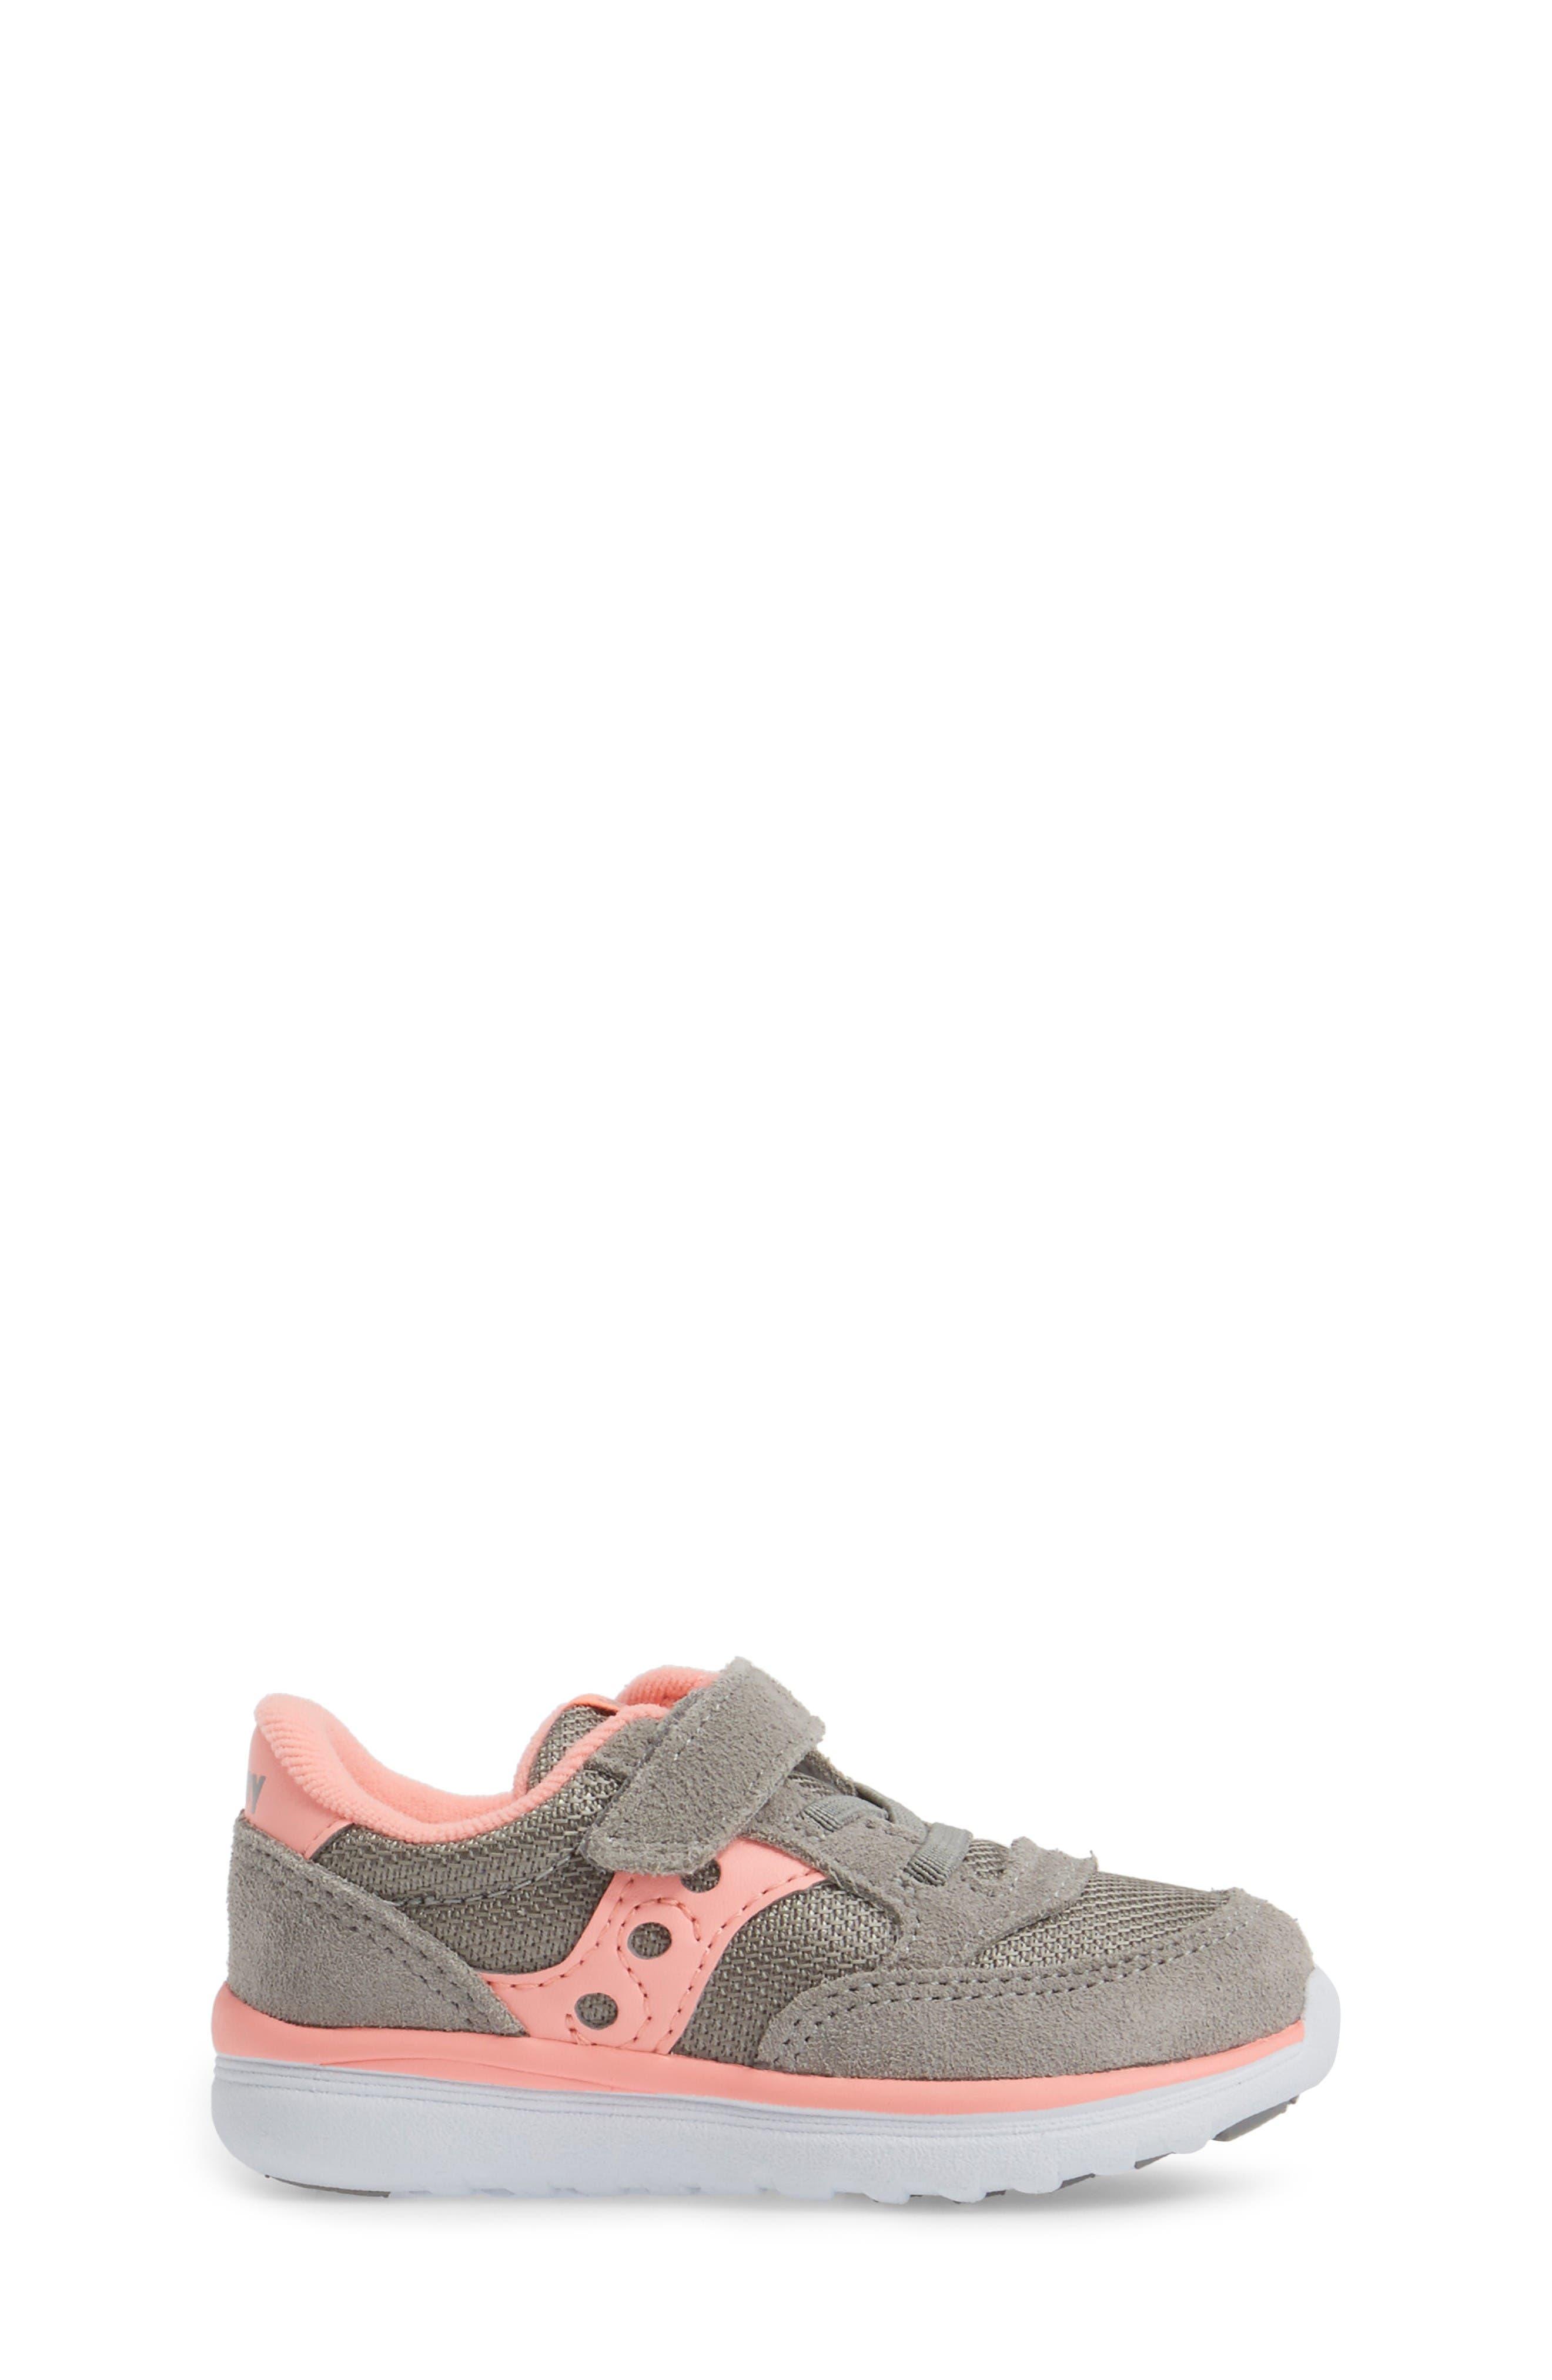 Jazz Lite Sneaker,                             Alternate thumbnail 3, color,                             Grey/ Coral